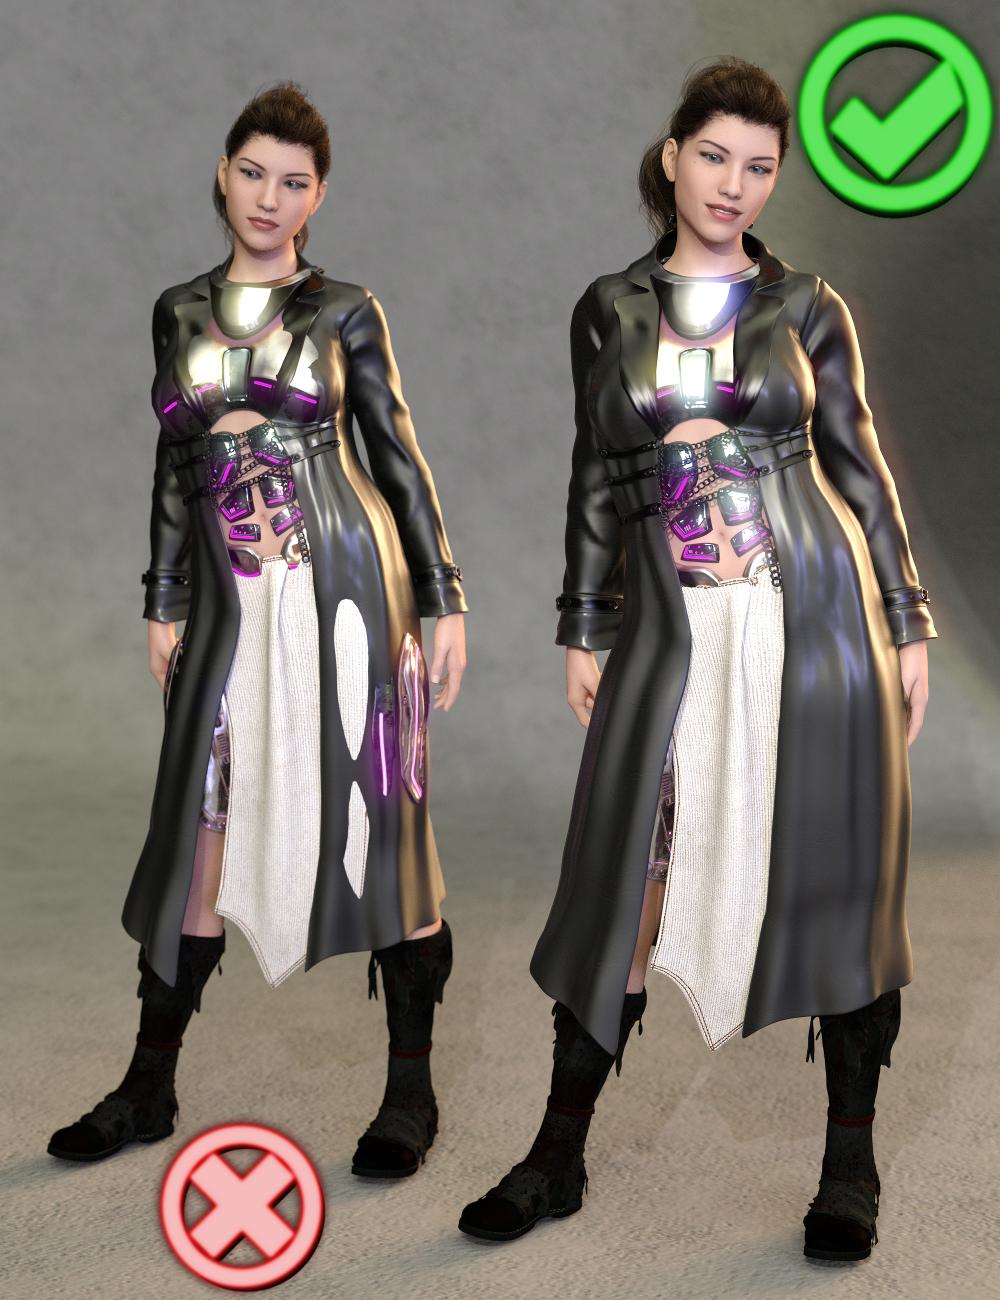 SY Clothing Fit Helper Genesis 8 Female by: Sickleyield, 3D Models by Daz 3D